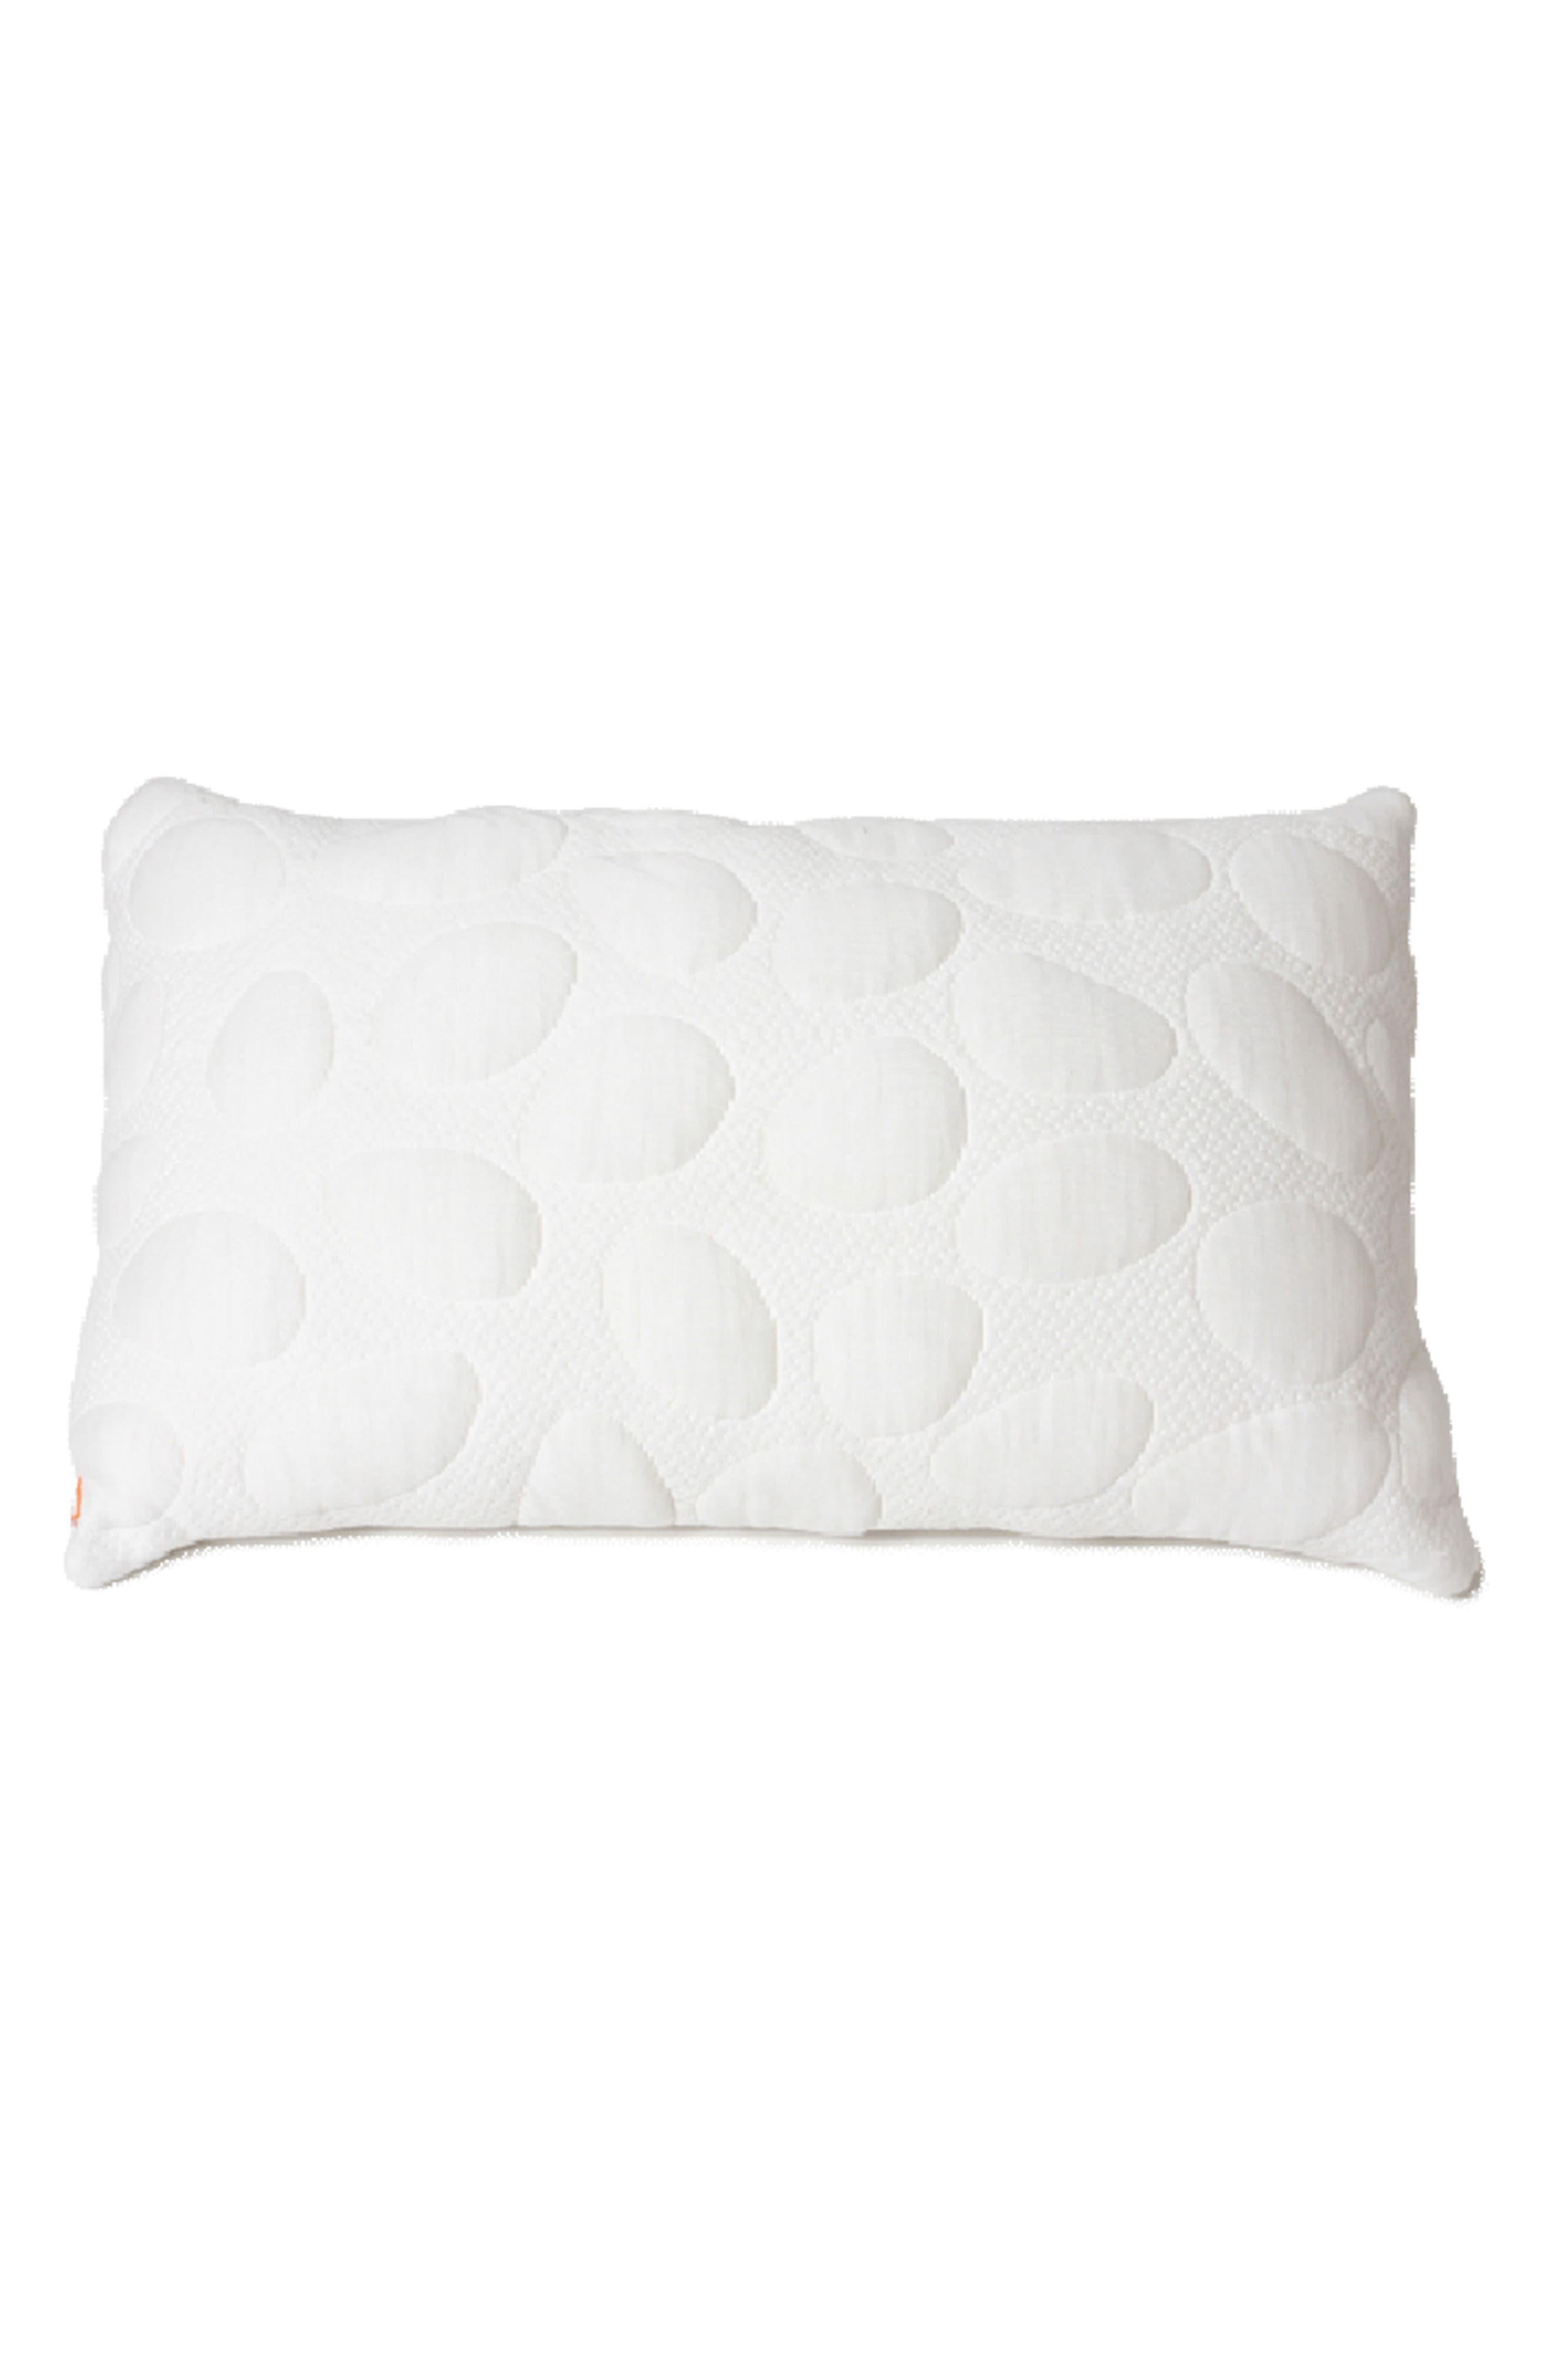 NOOK SLEEP SYSTEMS,                             Nook Pebble Jr. Pillow,                             Main thumbnail 1, color,                             100